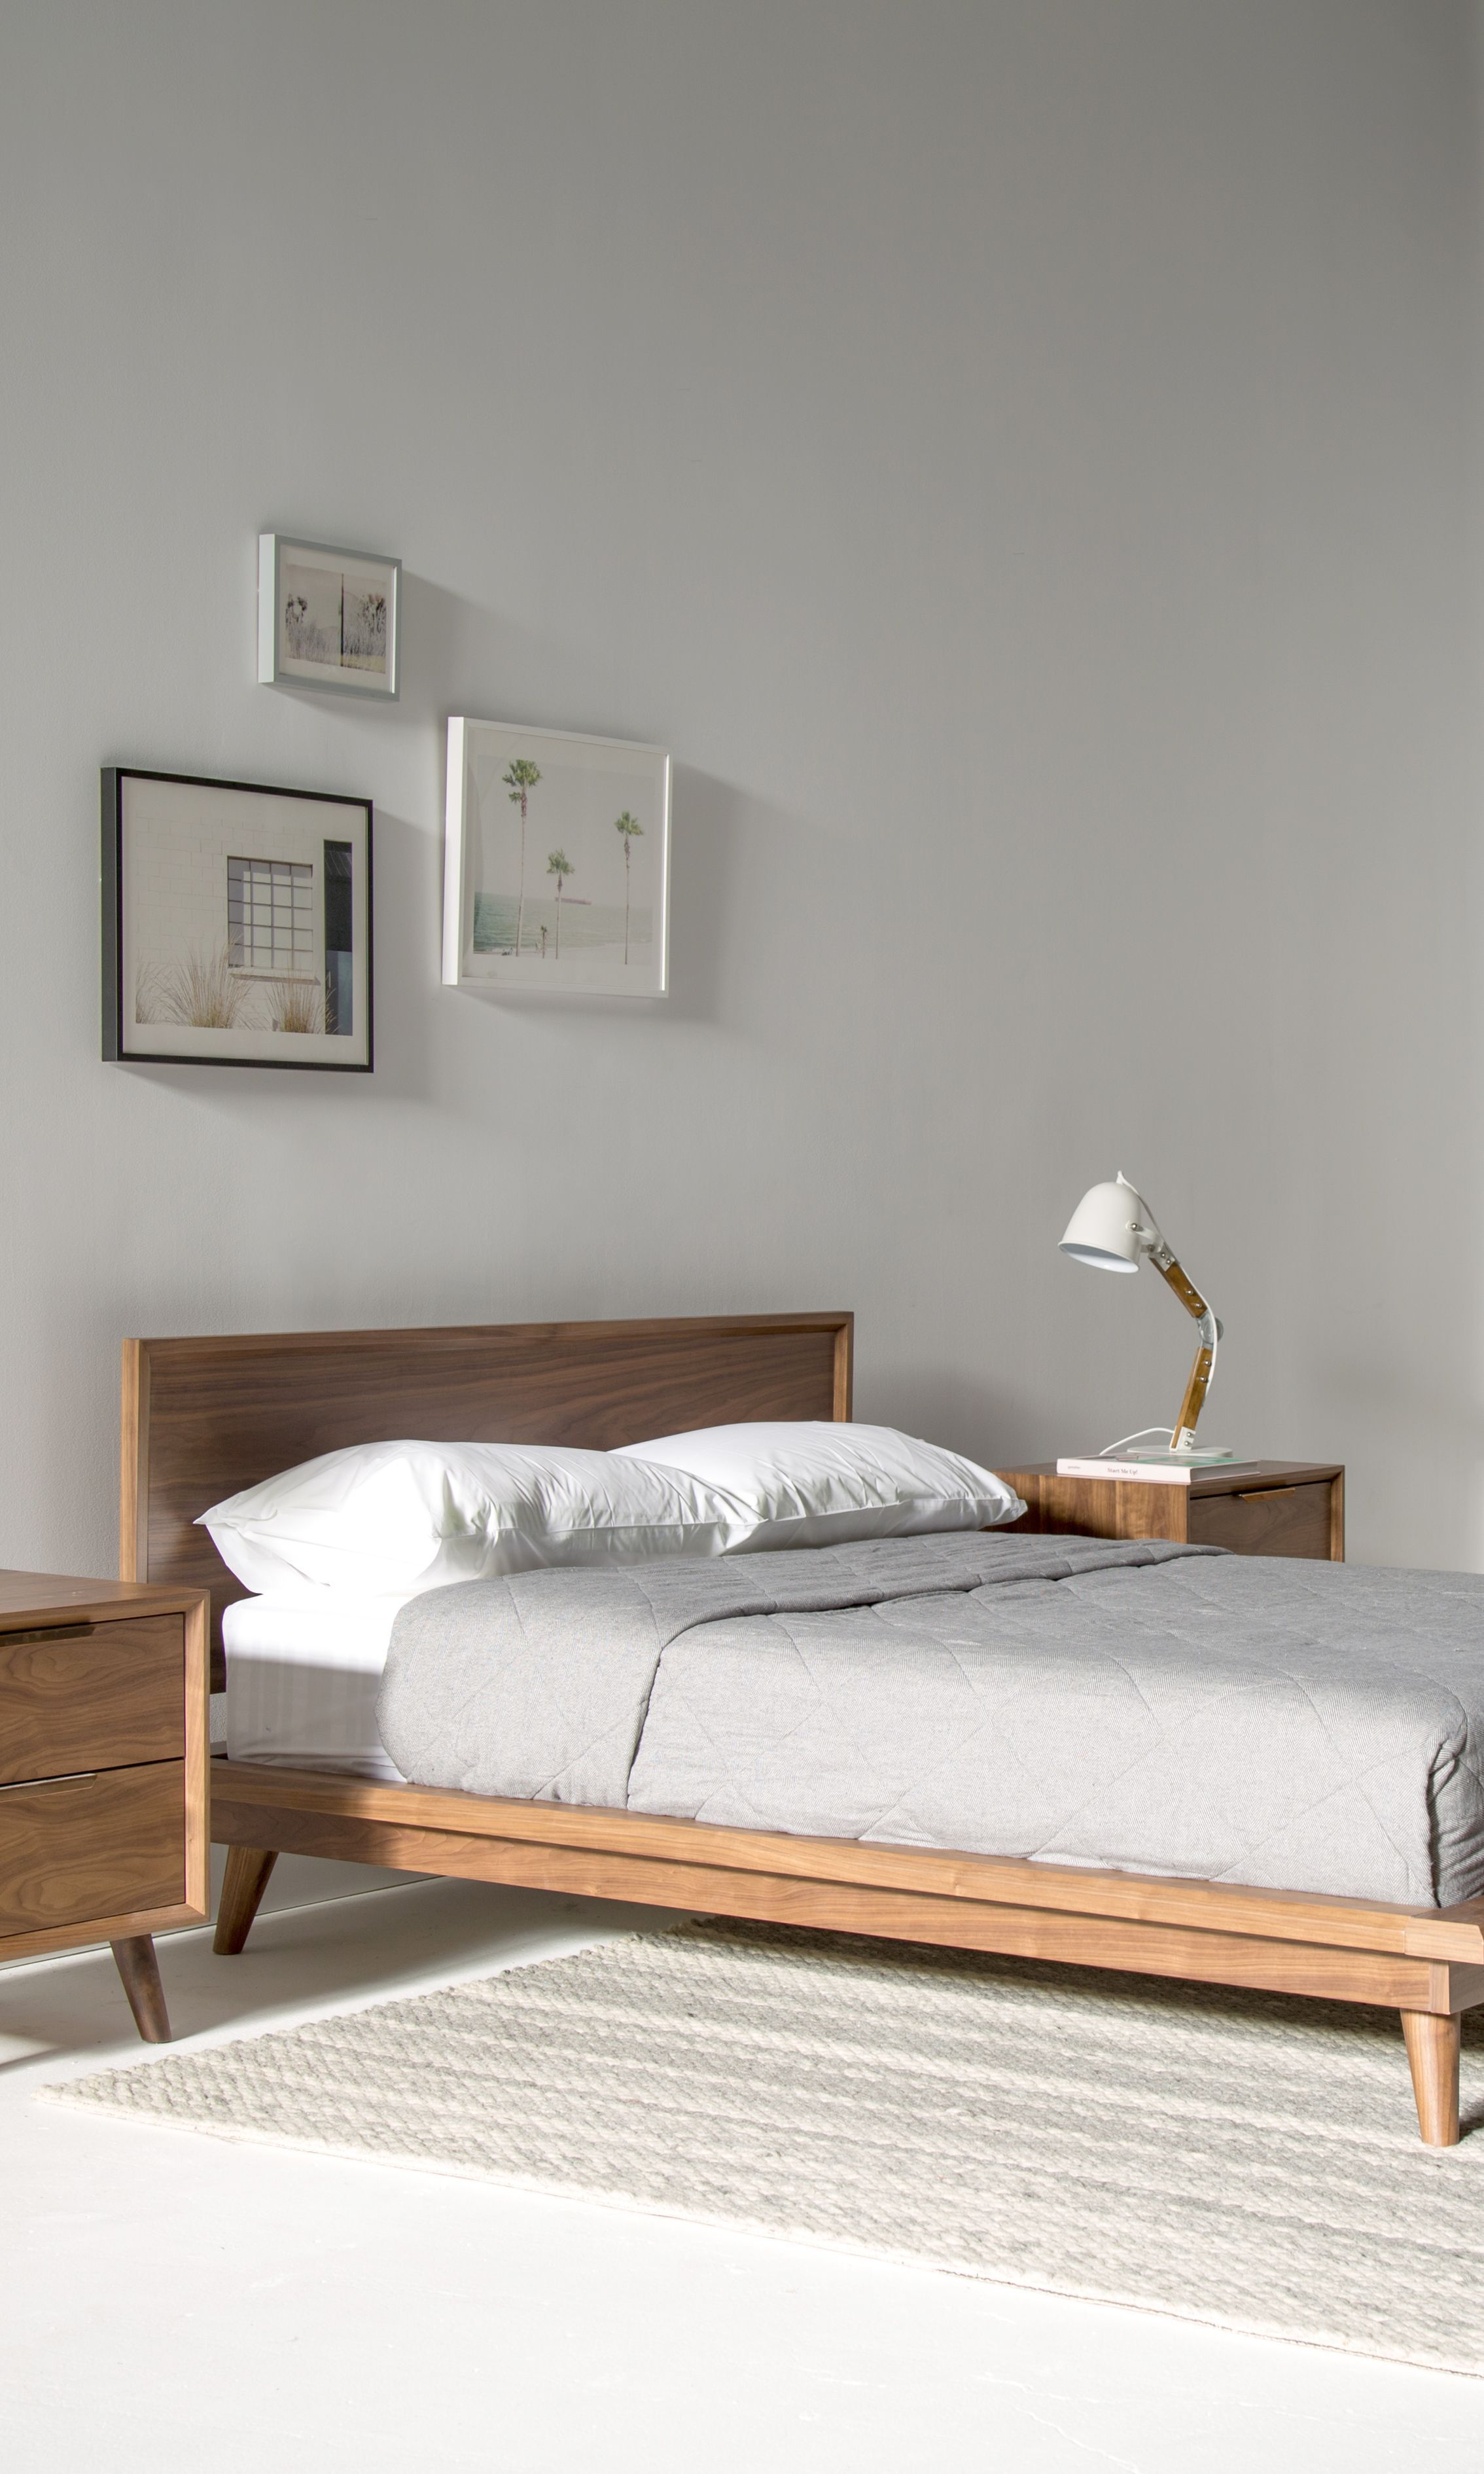 Model bedroom for the modern home enthusiast #homegoals | Bedroom ...